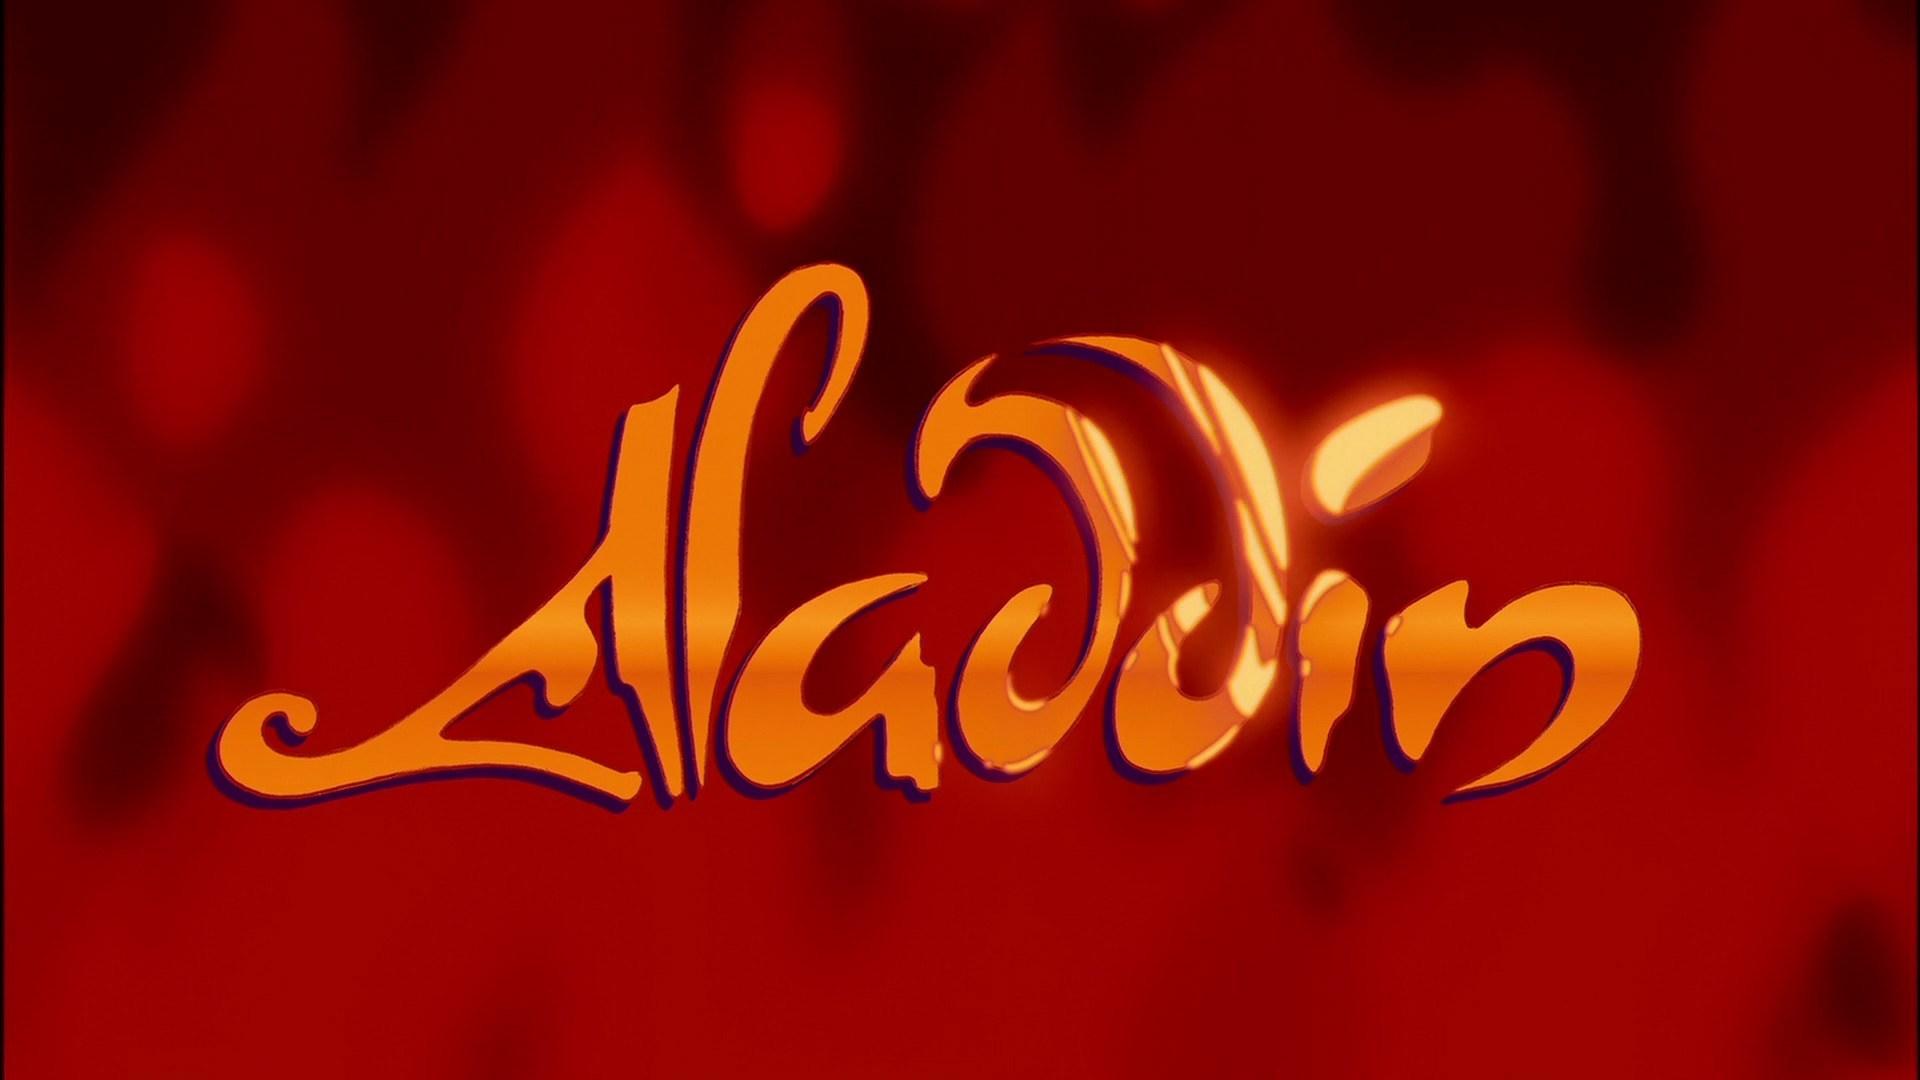 Aladdin (Disneys Sverige) (@codyslampshop) Cover Image